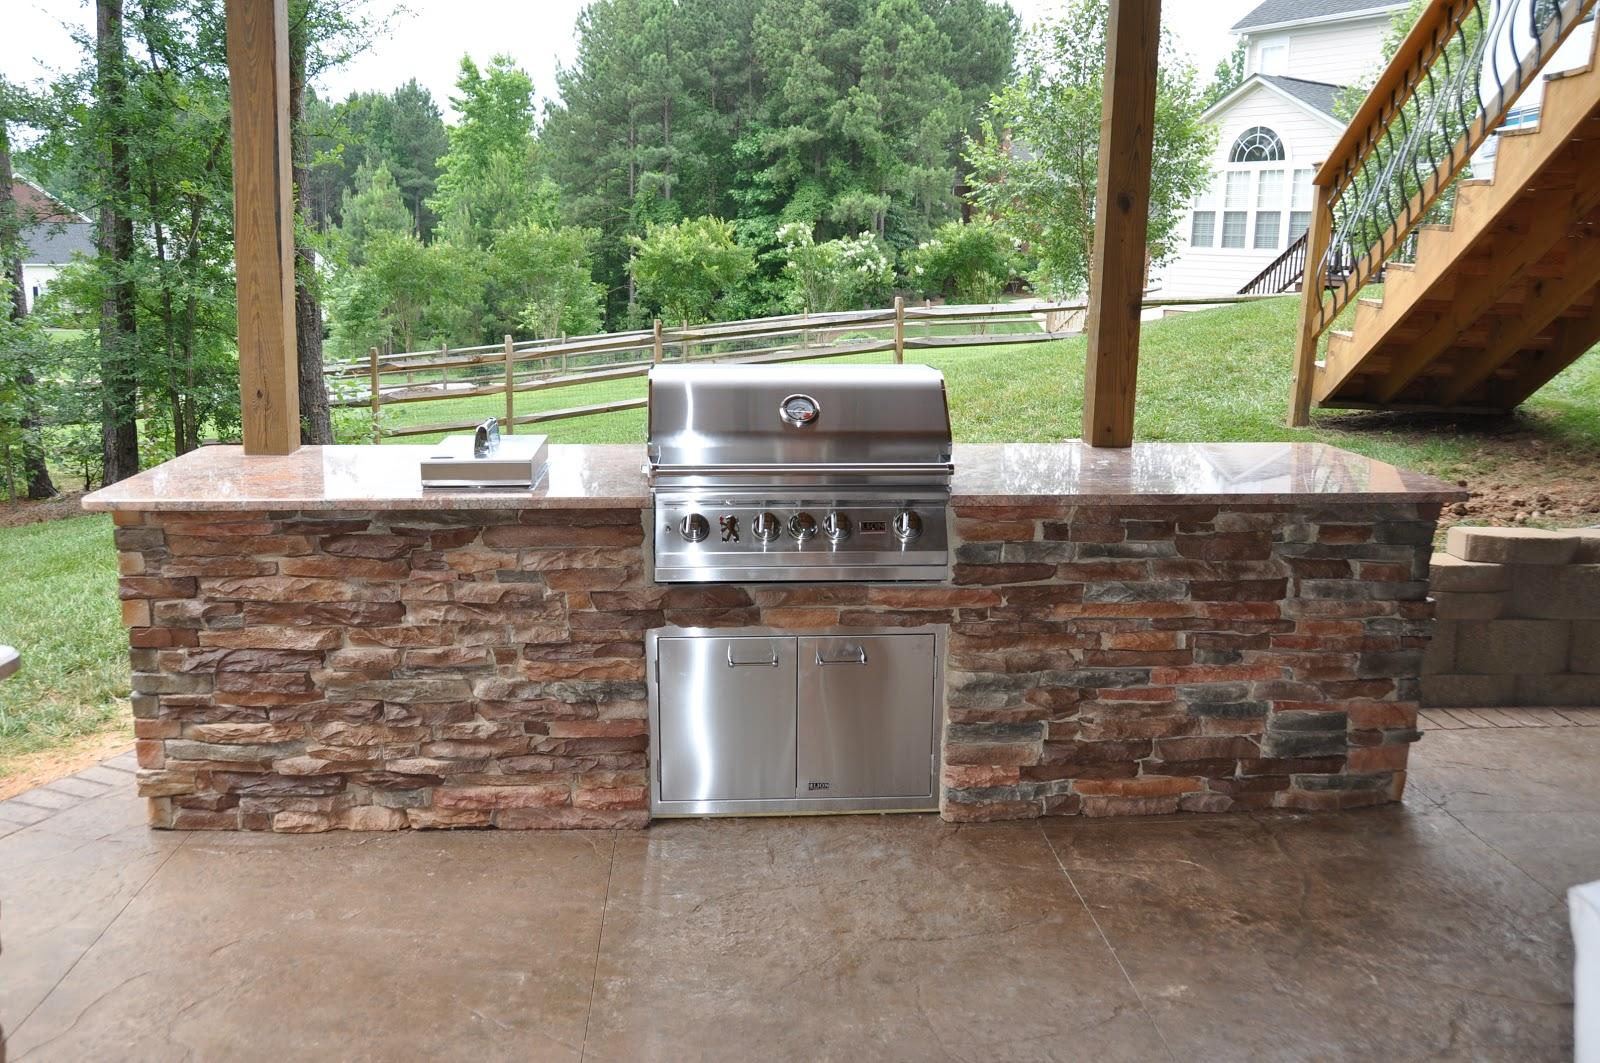 Outdoor Küchengeräte : Outdoor küche amazon bausatz 4 ratgeber backöfen and küchengeräte